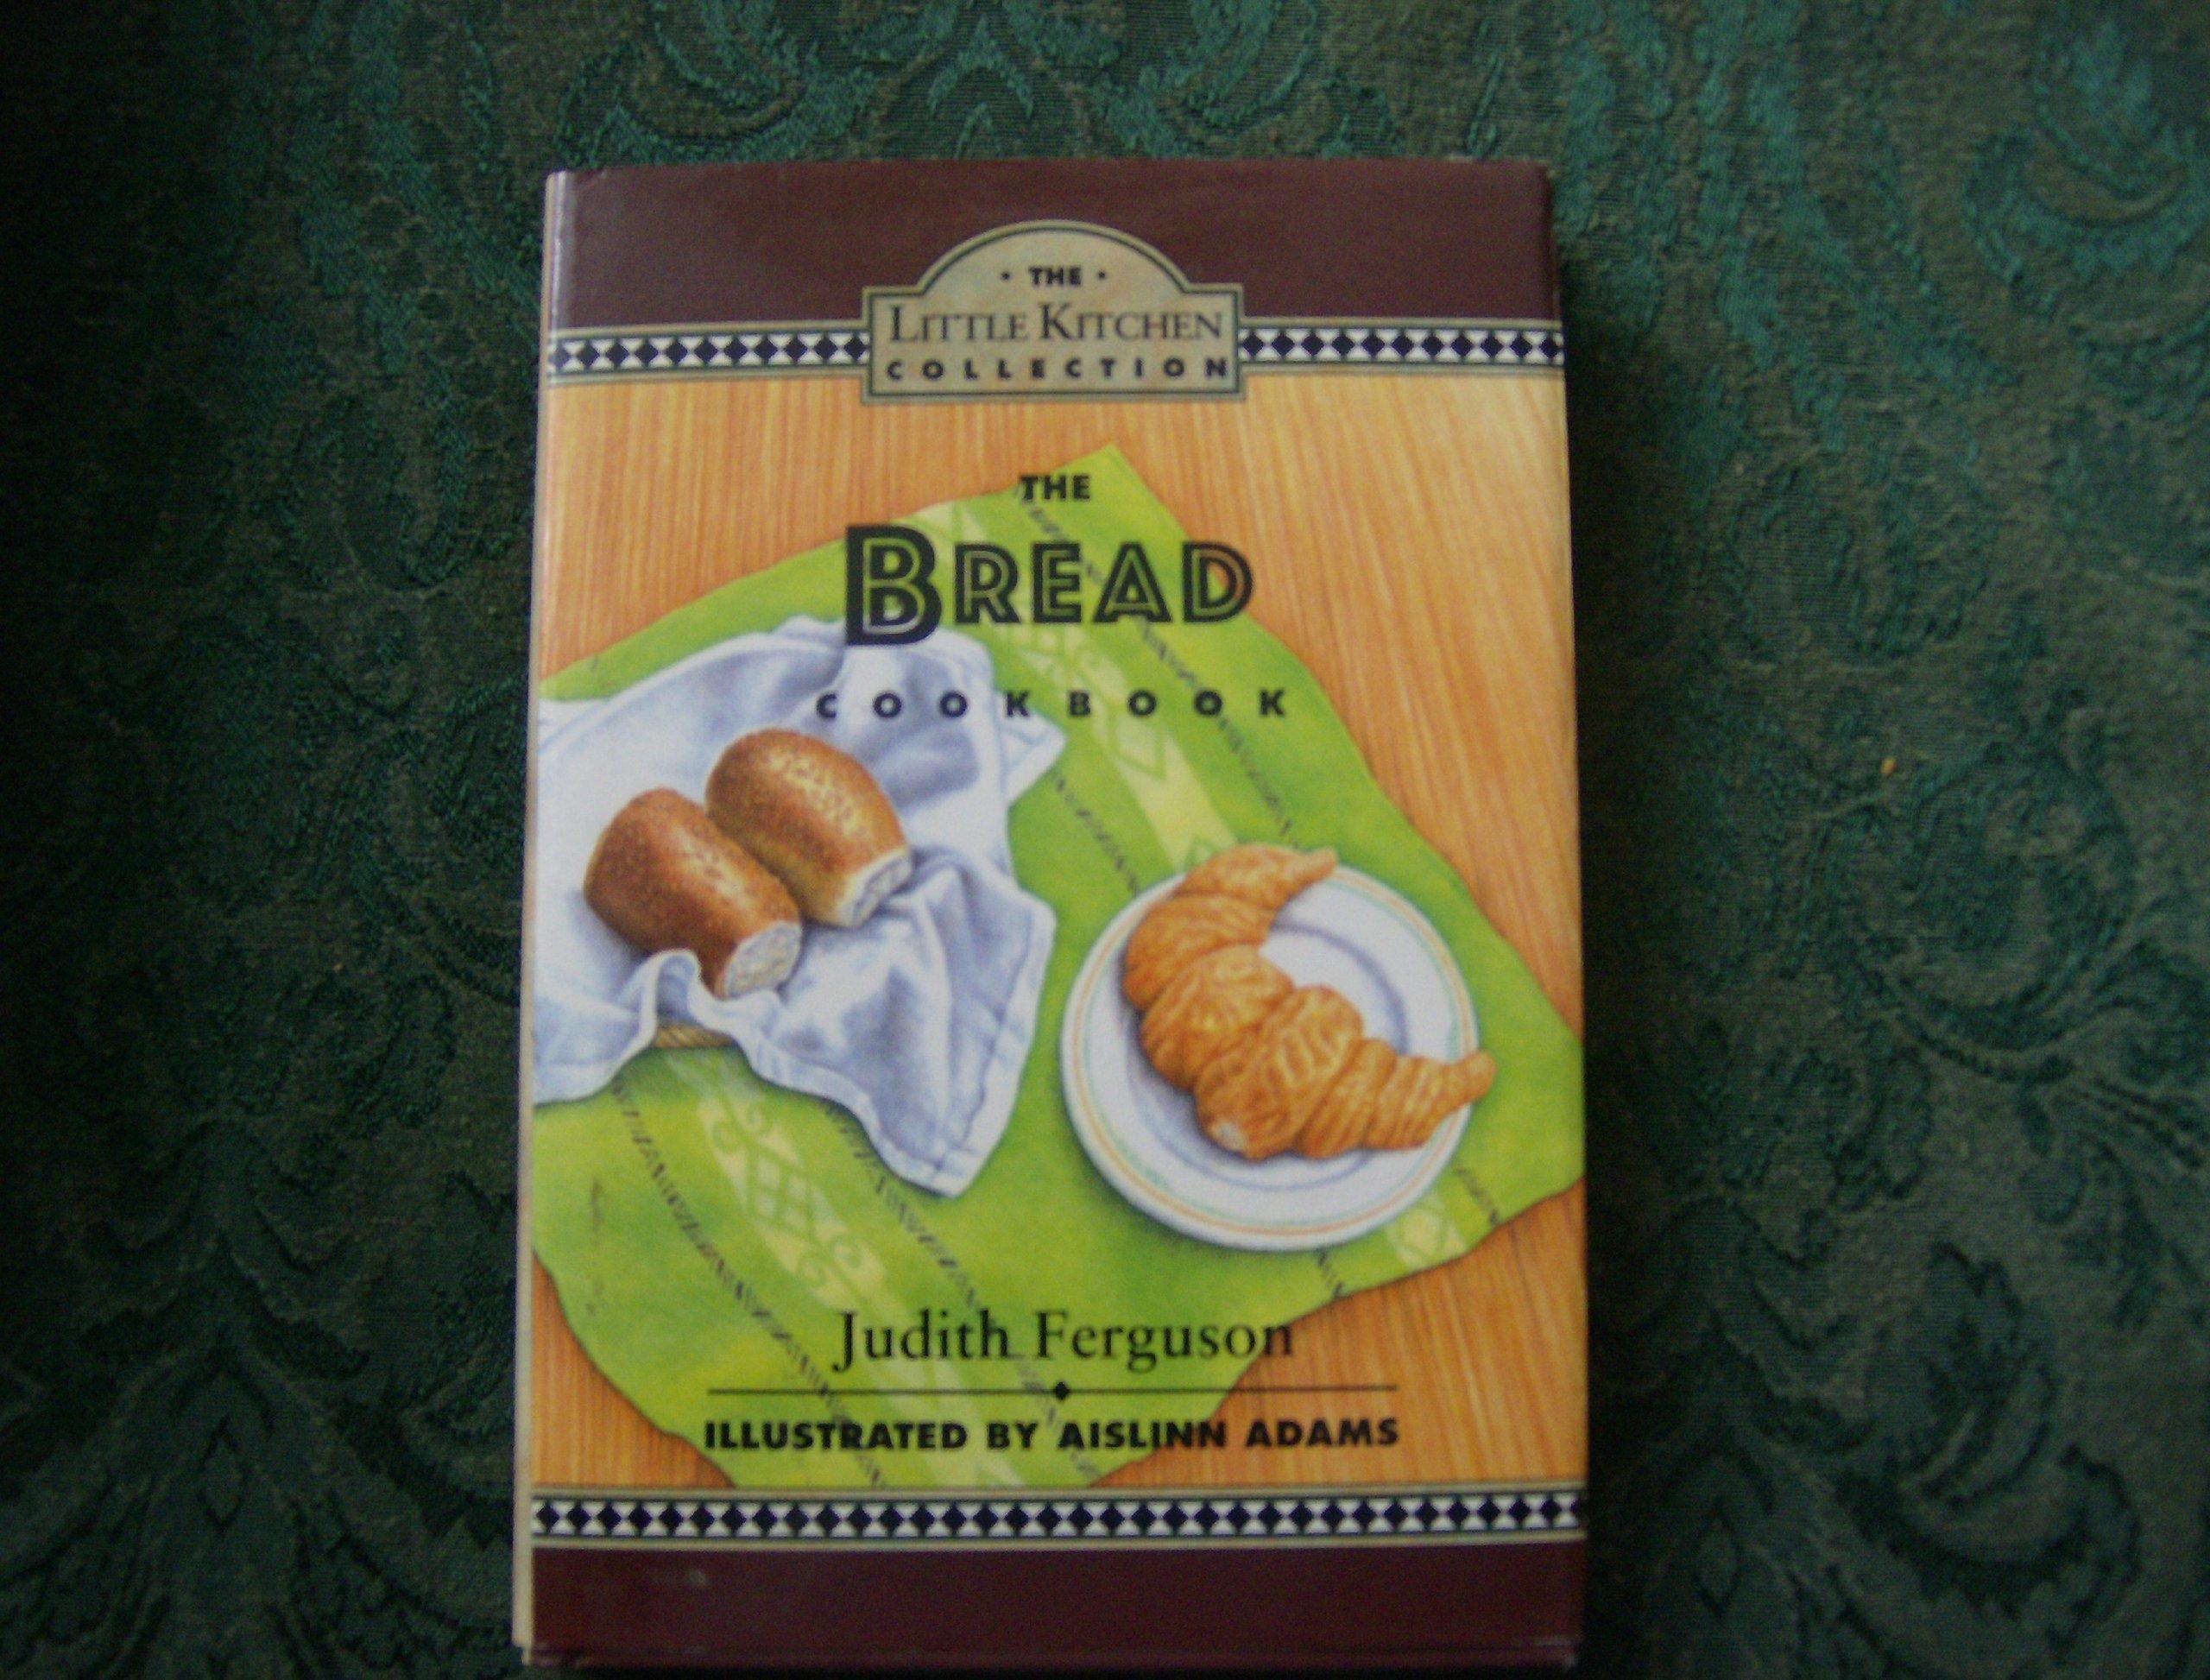 The Bread Cookbook The Little Kitchen Collection Judith Ferguson